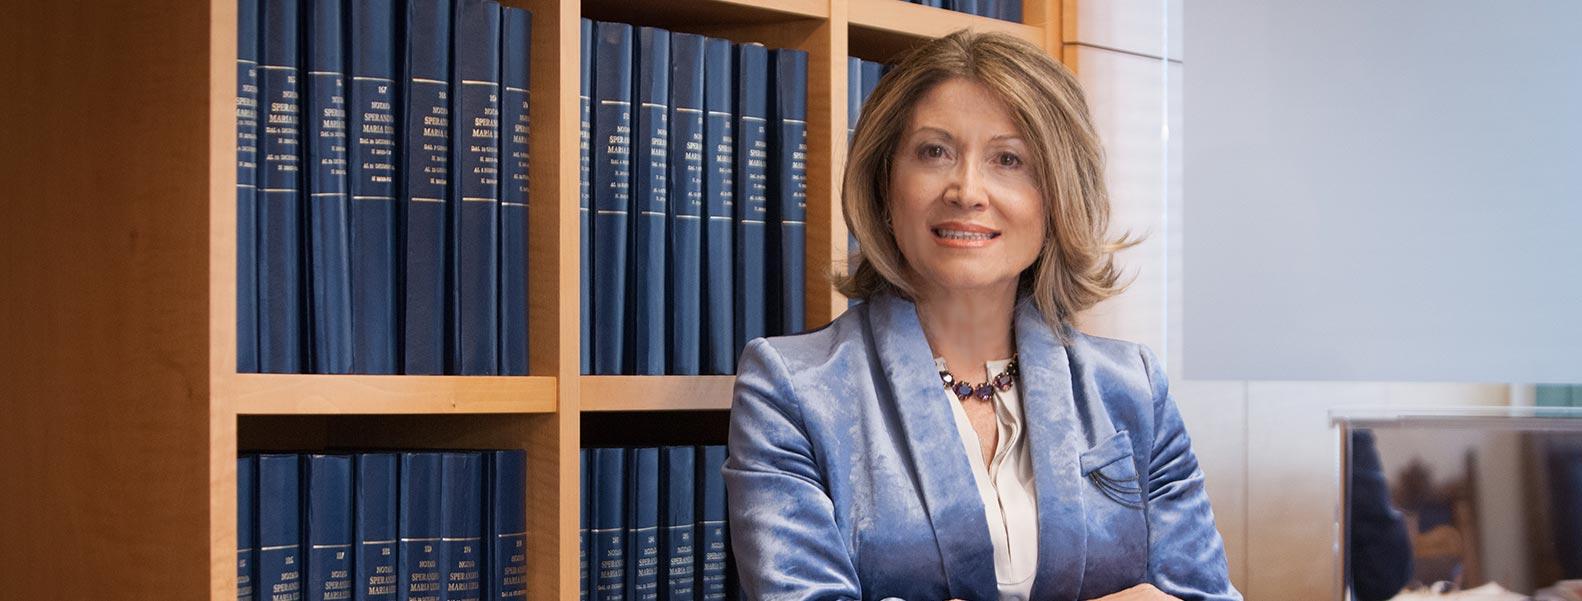 Dottoressa Maria Luisa Sperandeo